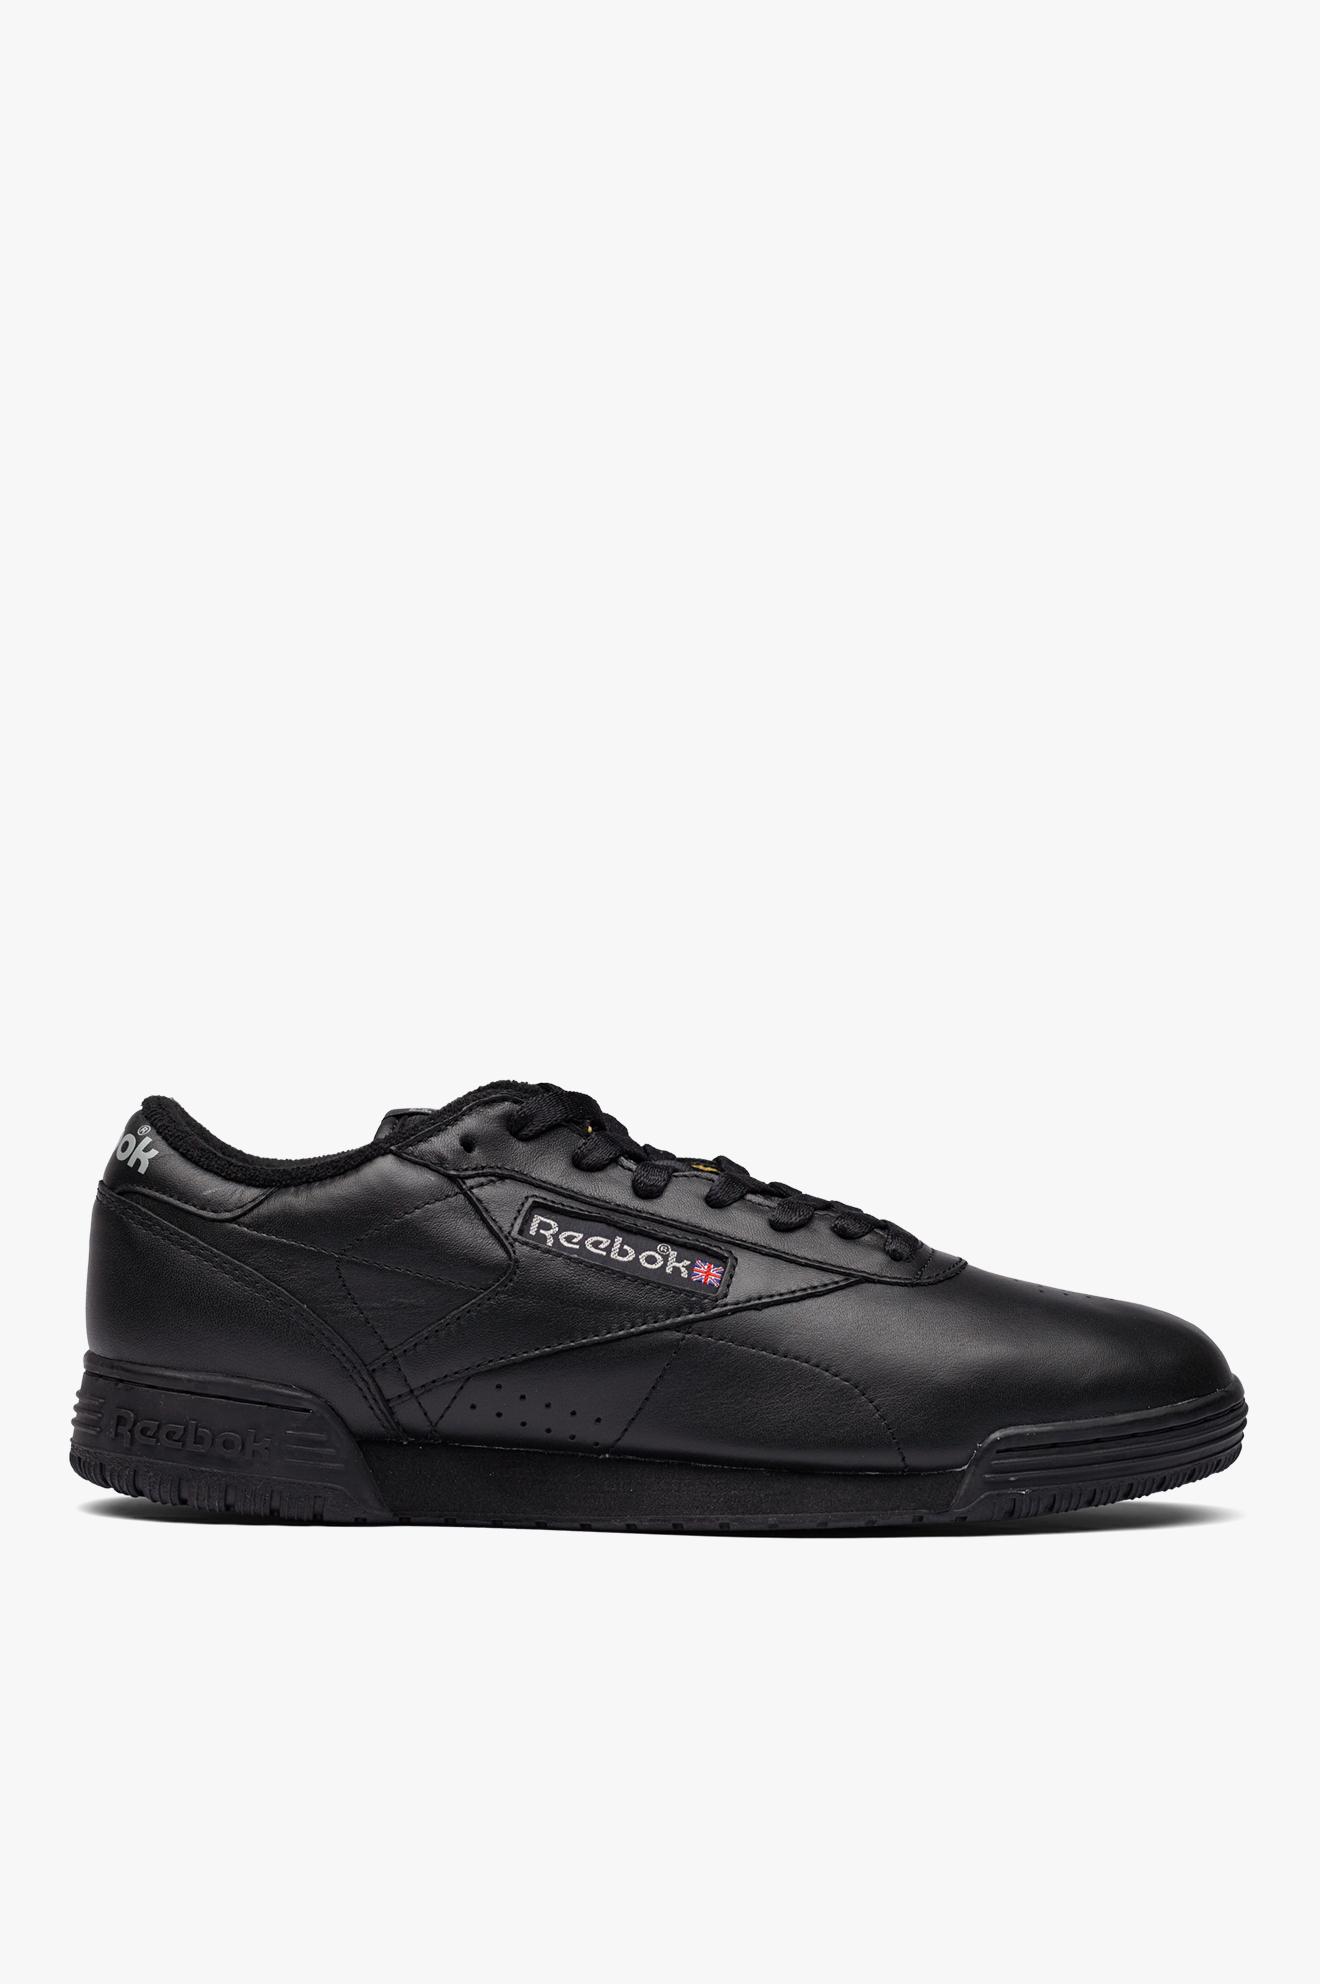 Exofit Lo Clean Vintage Black